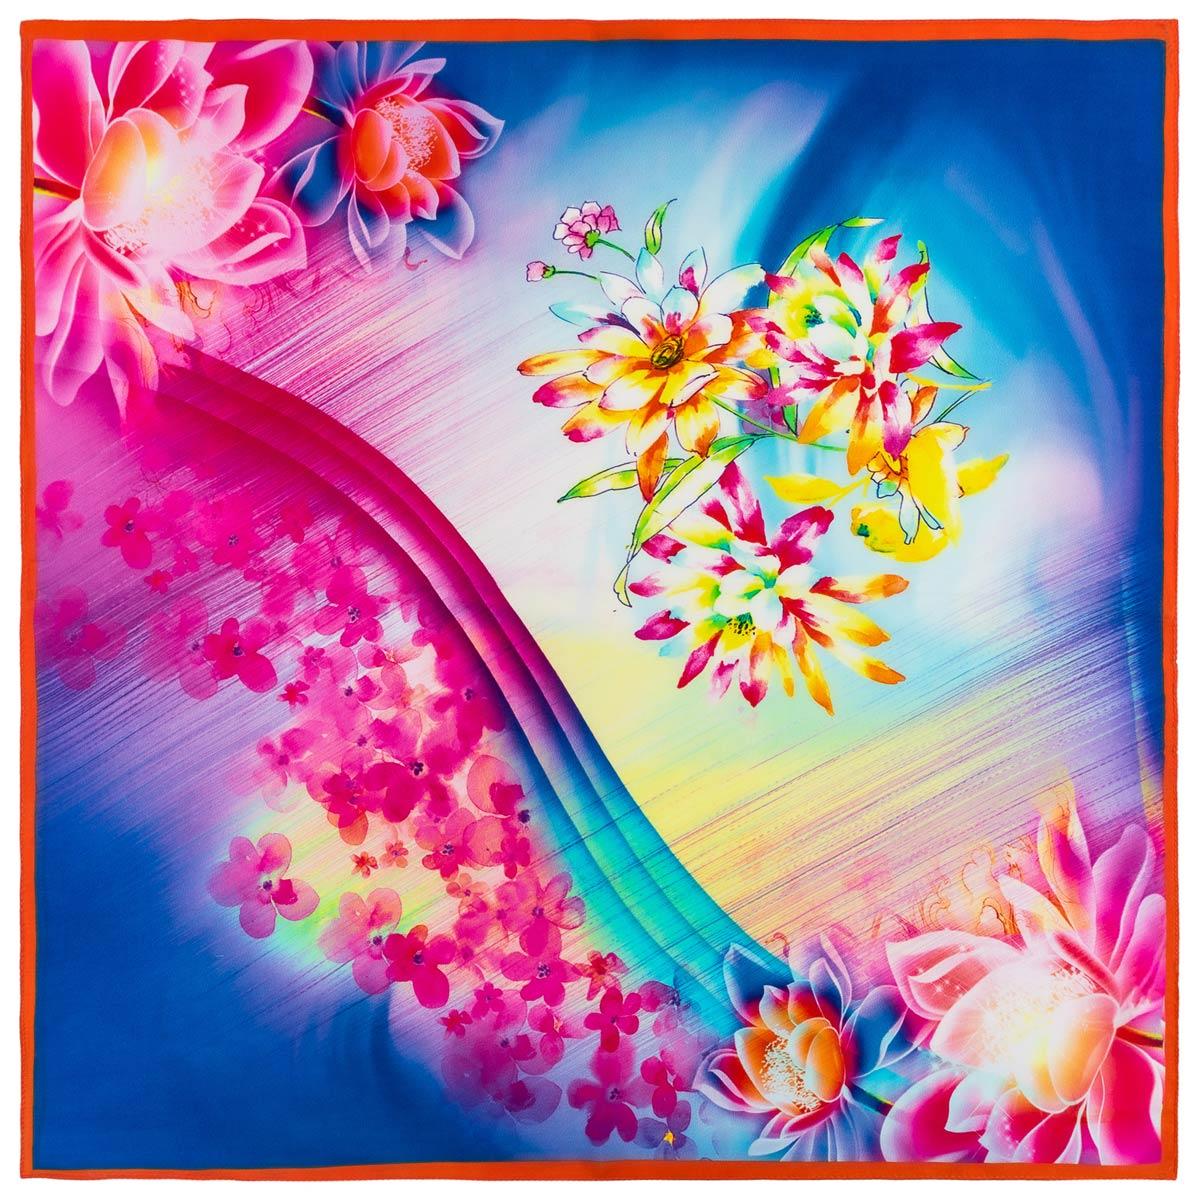 AT-06366_A12-1-carre-soie-multicolore-floral